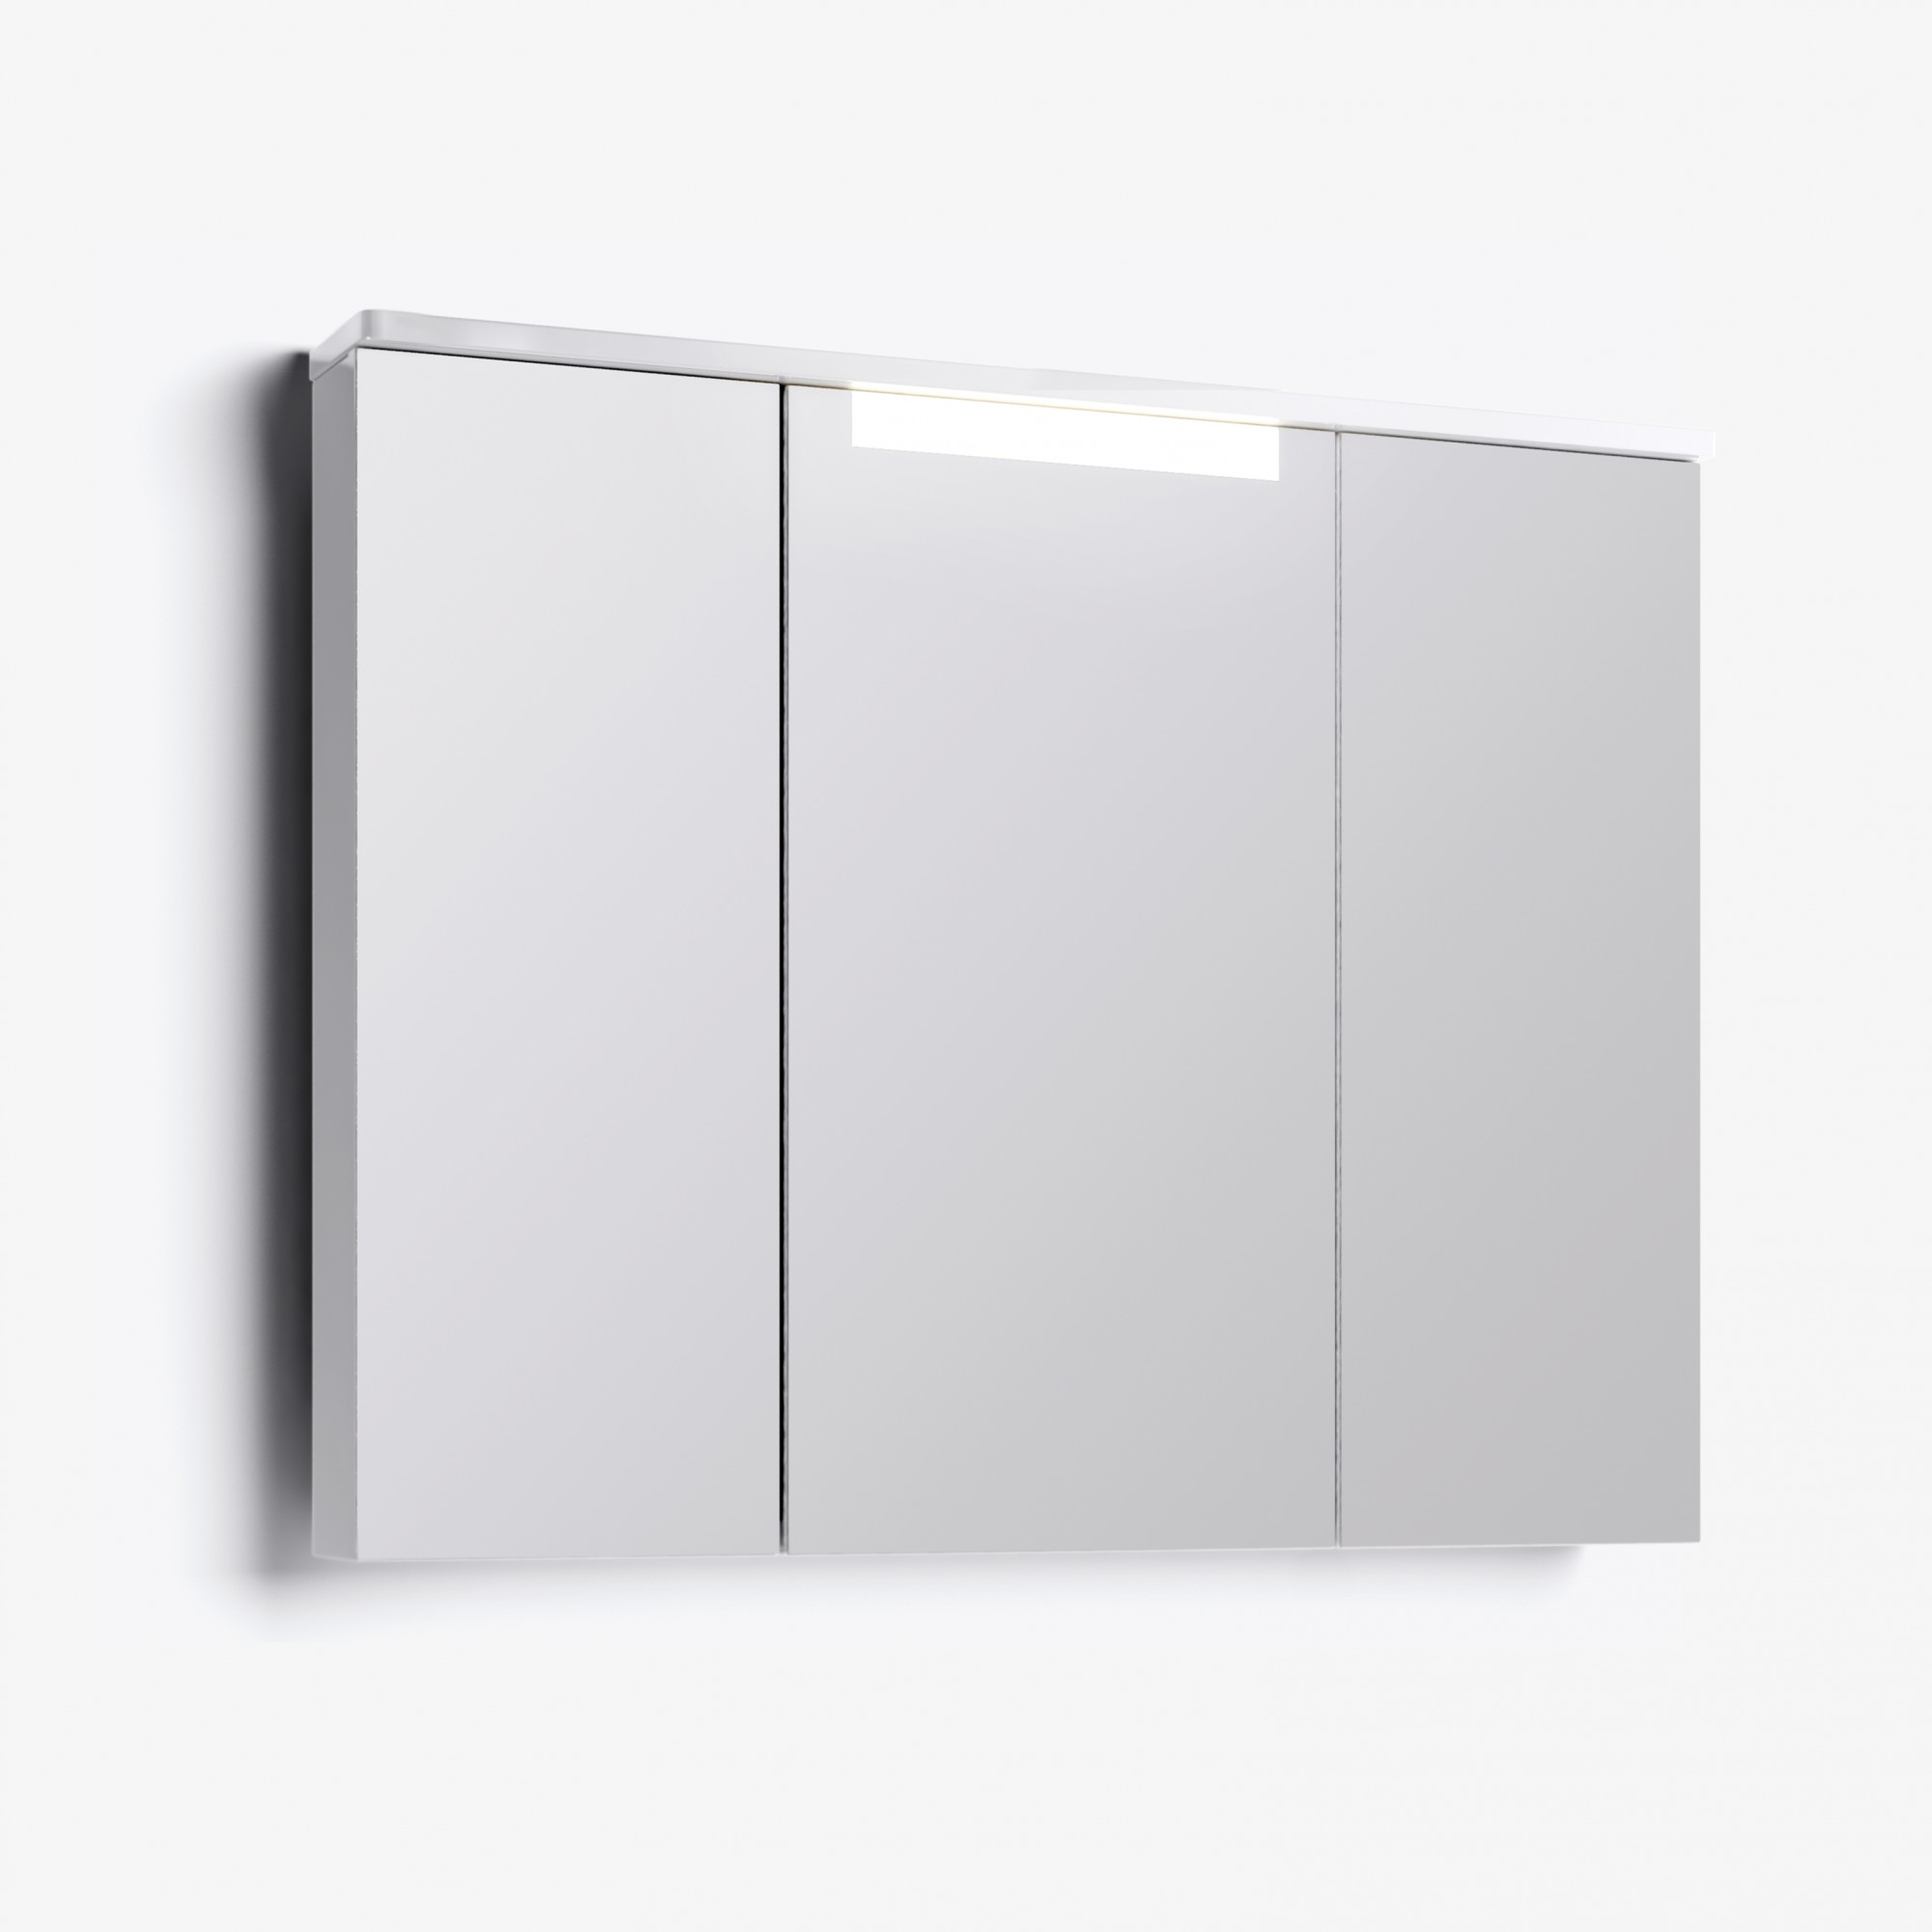 Шкаф зеркальный Лорен 100 +11 150 руб.